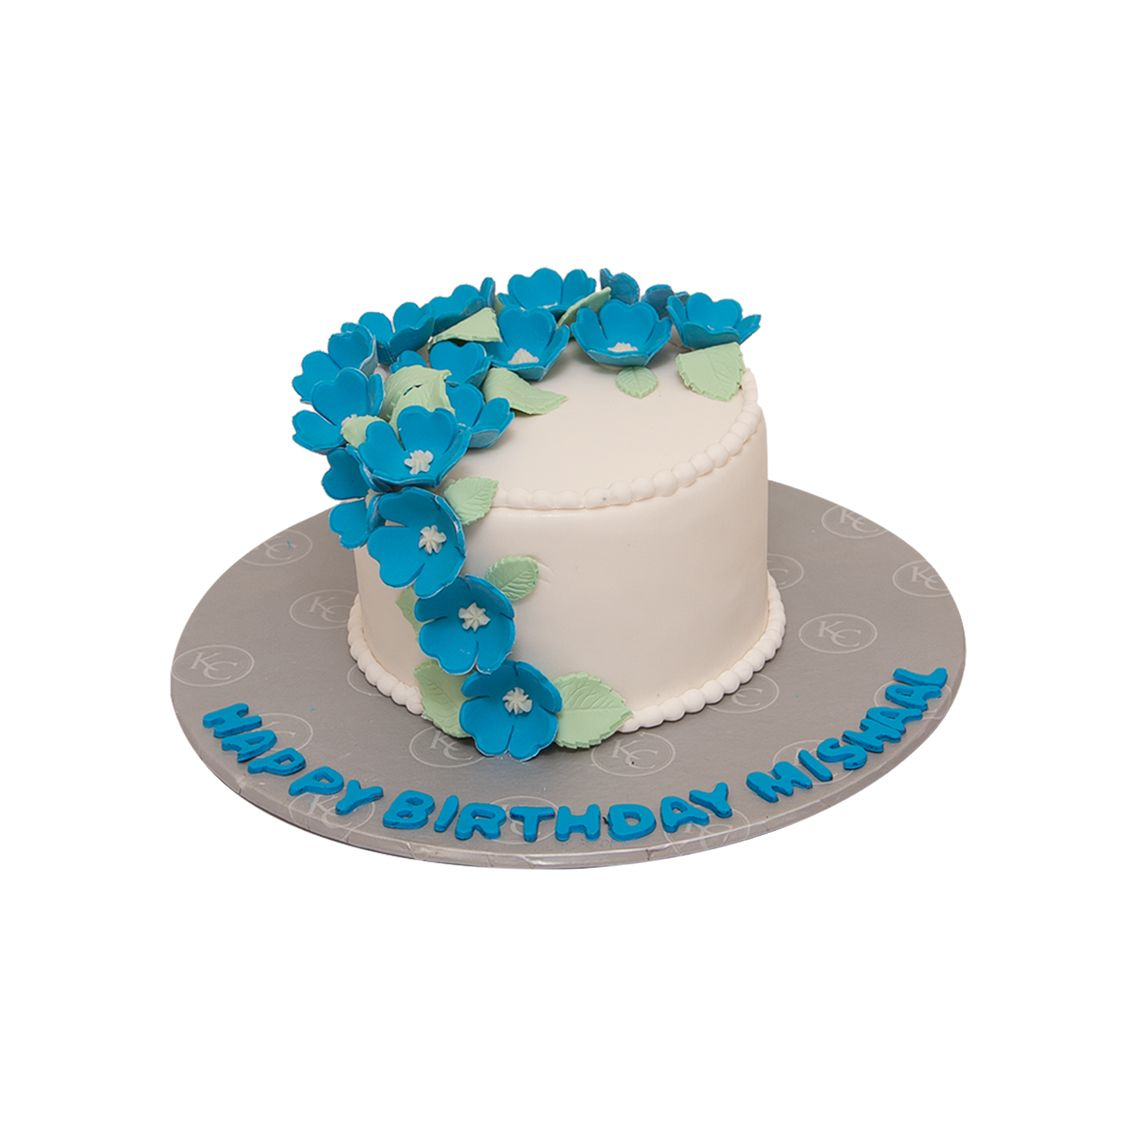 Kitchen Cuisine Default Category Blue Flower Cake